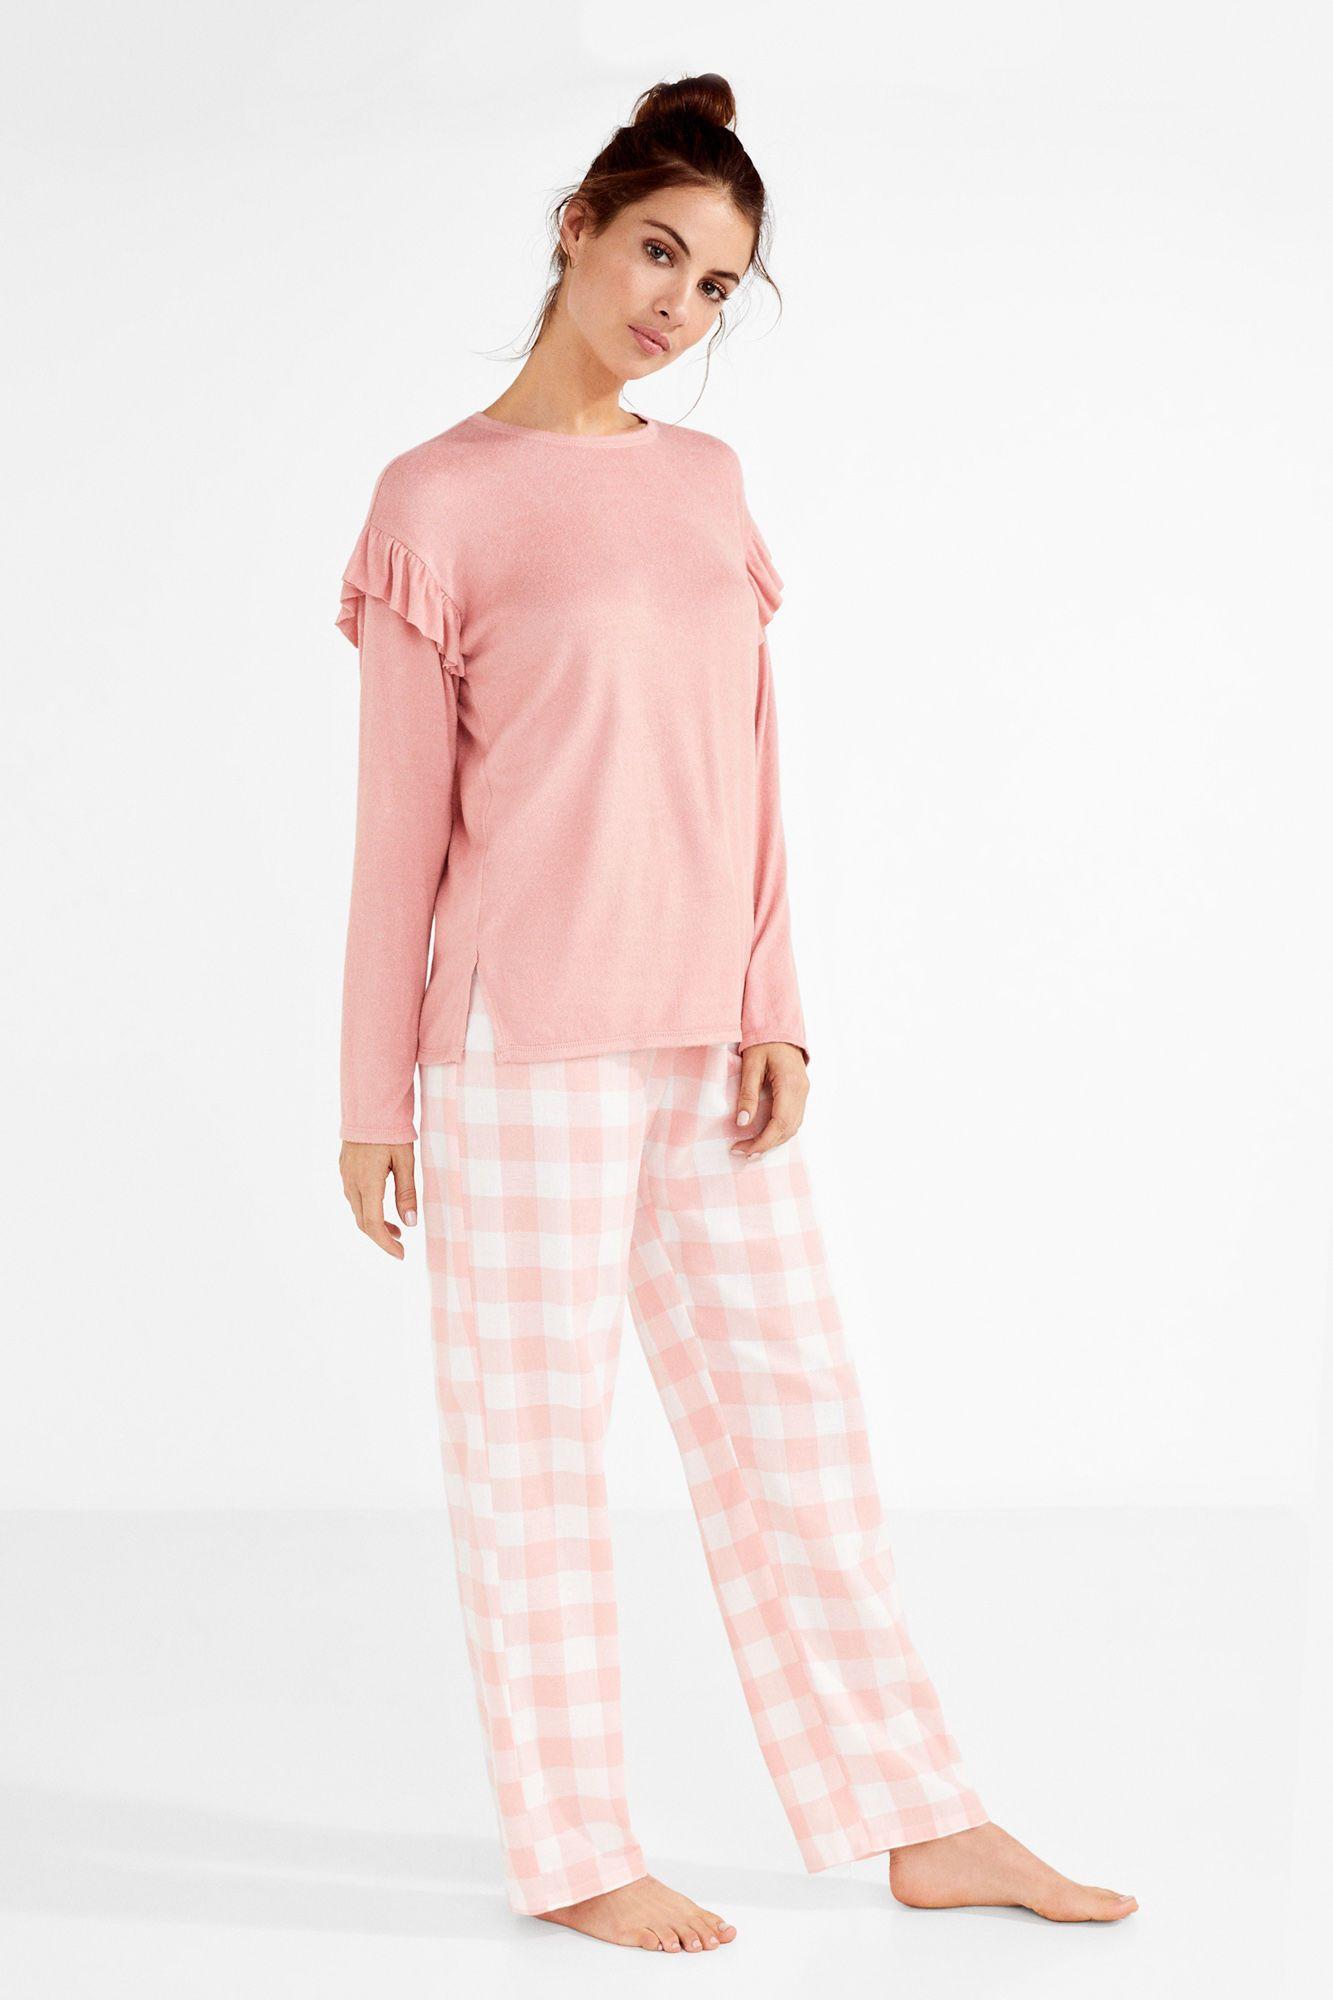 Ladies Pyjama Sets Embroidered Short Sleeve Crew Neck Plain Button Nightwear PJs